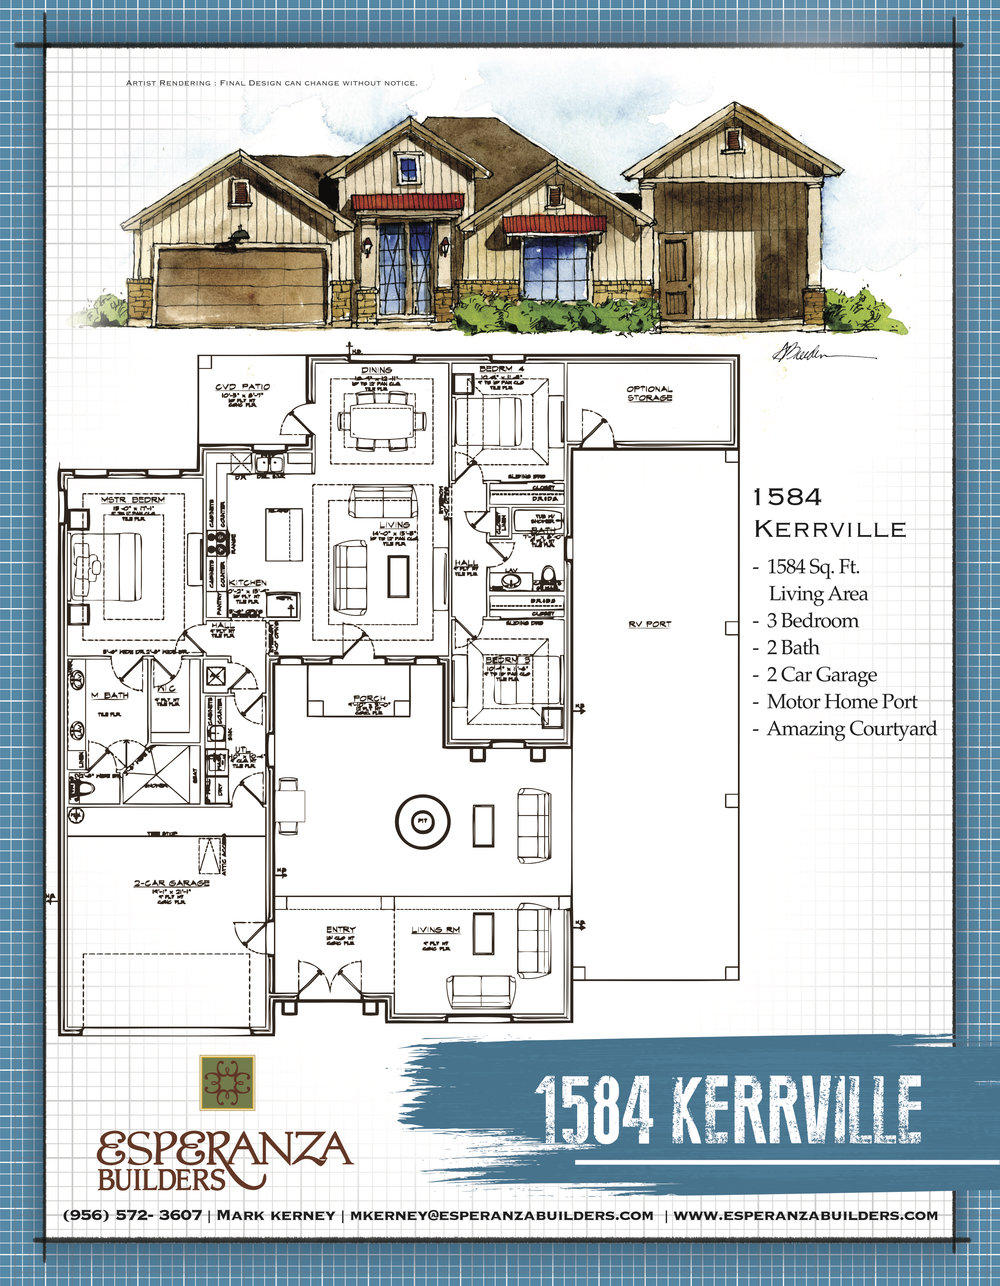 0119-07 Esperanza Group 8x5 Insert BG-1584-Kerrville copy.jpg